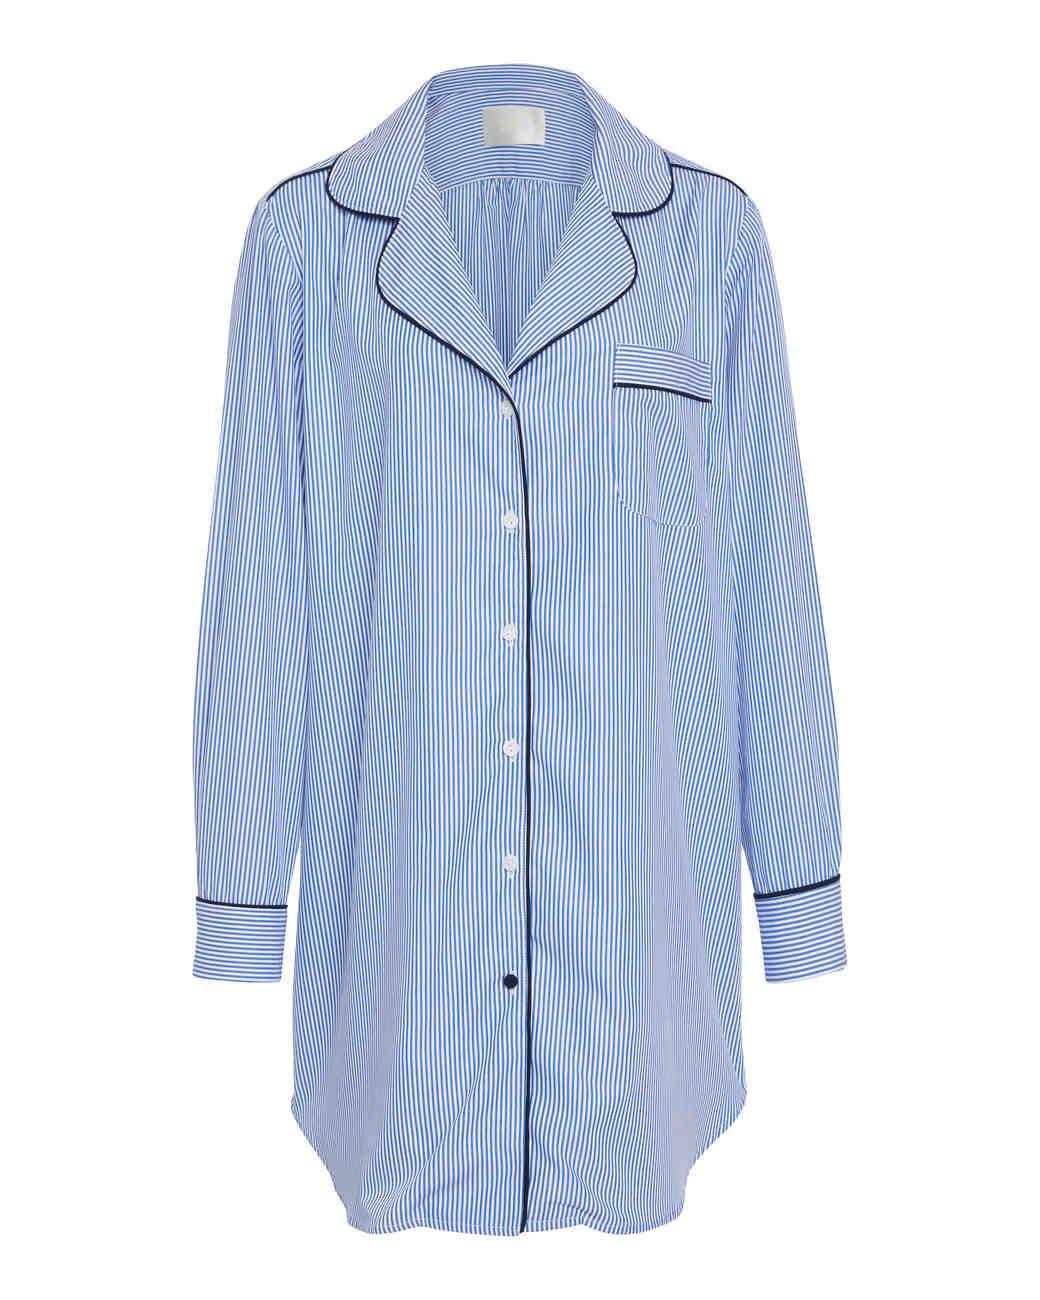 bridesmaid robe alternatives piu lifestyle sleep shirt